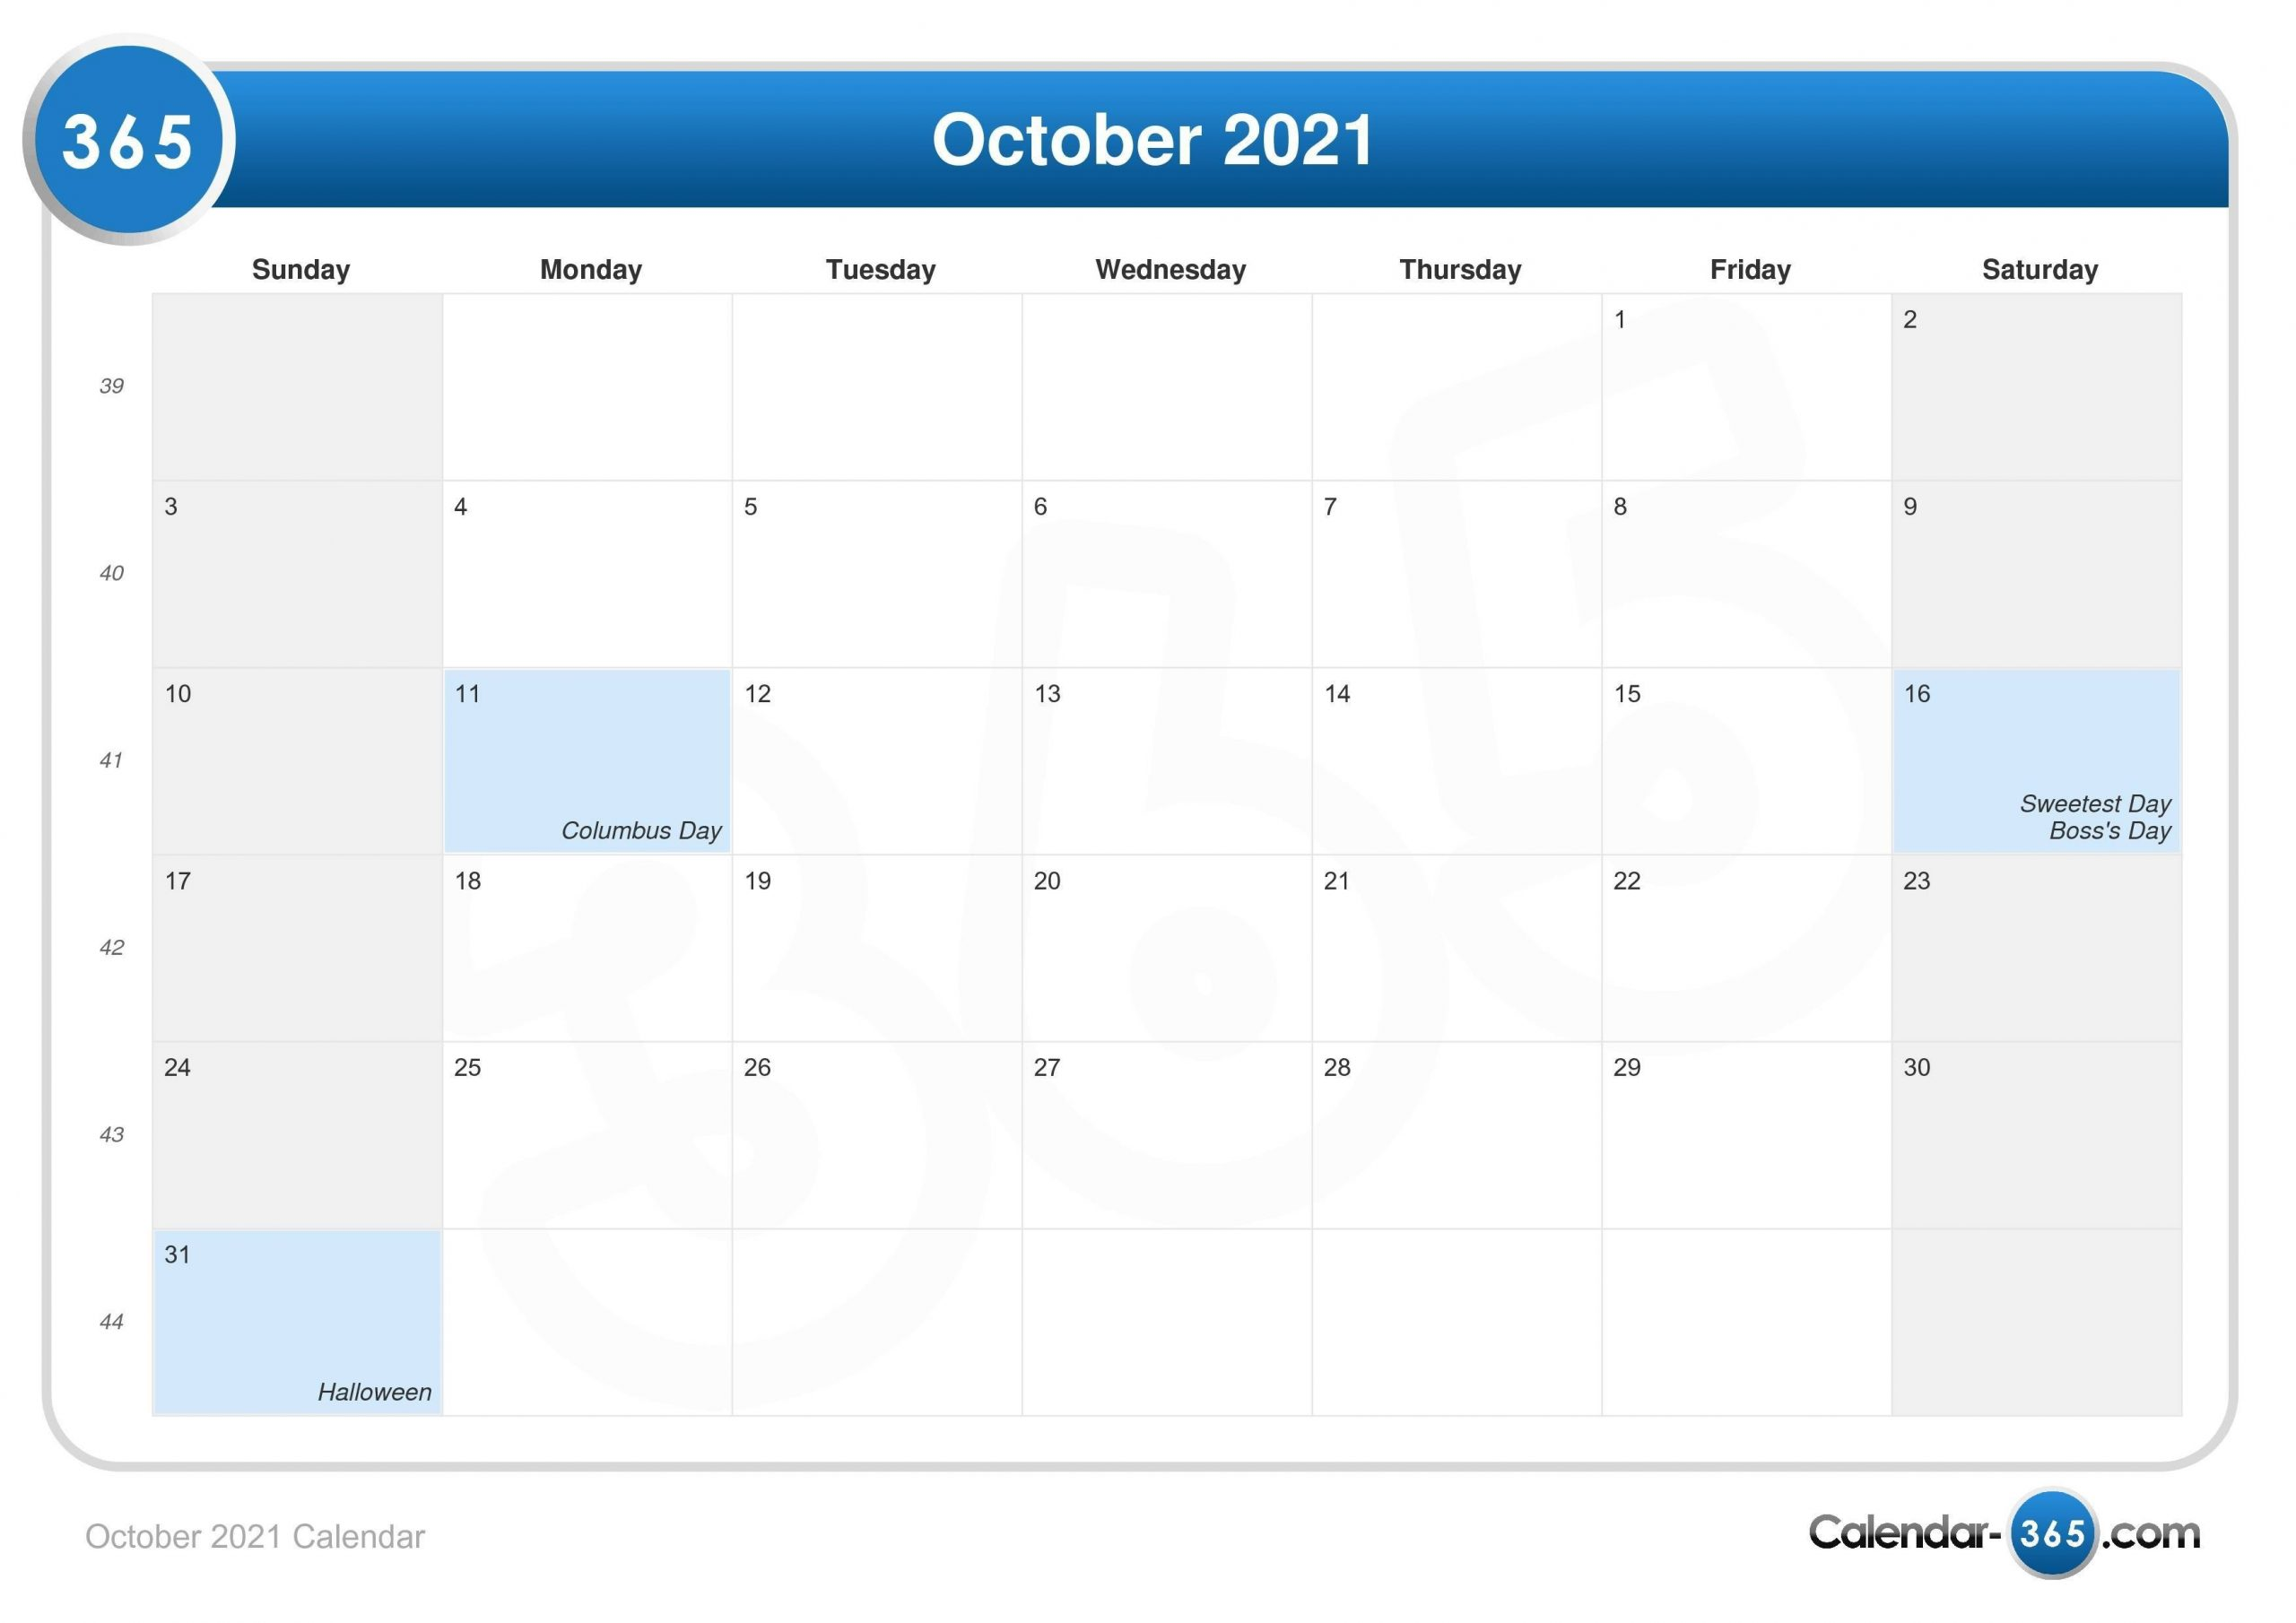 October 2021 Calendar-Jewish Calendar For October 2021